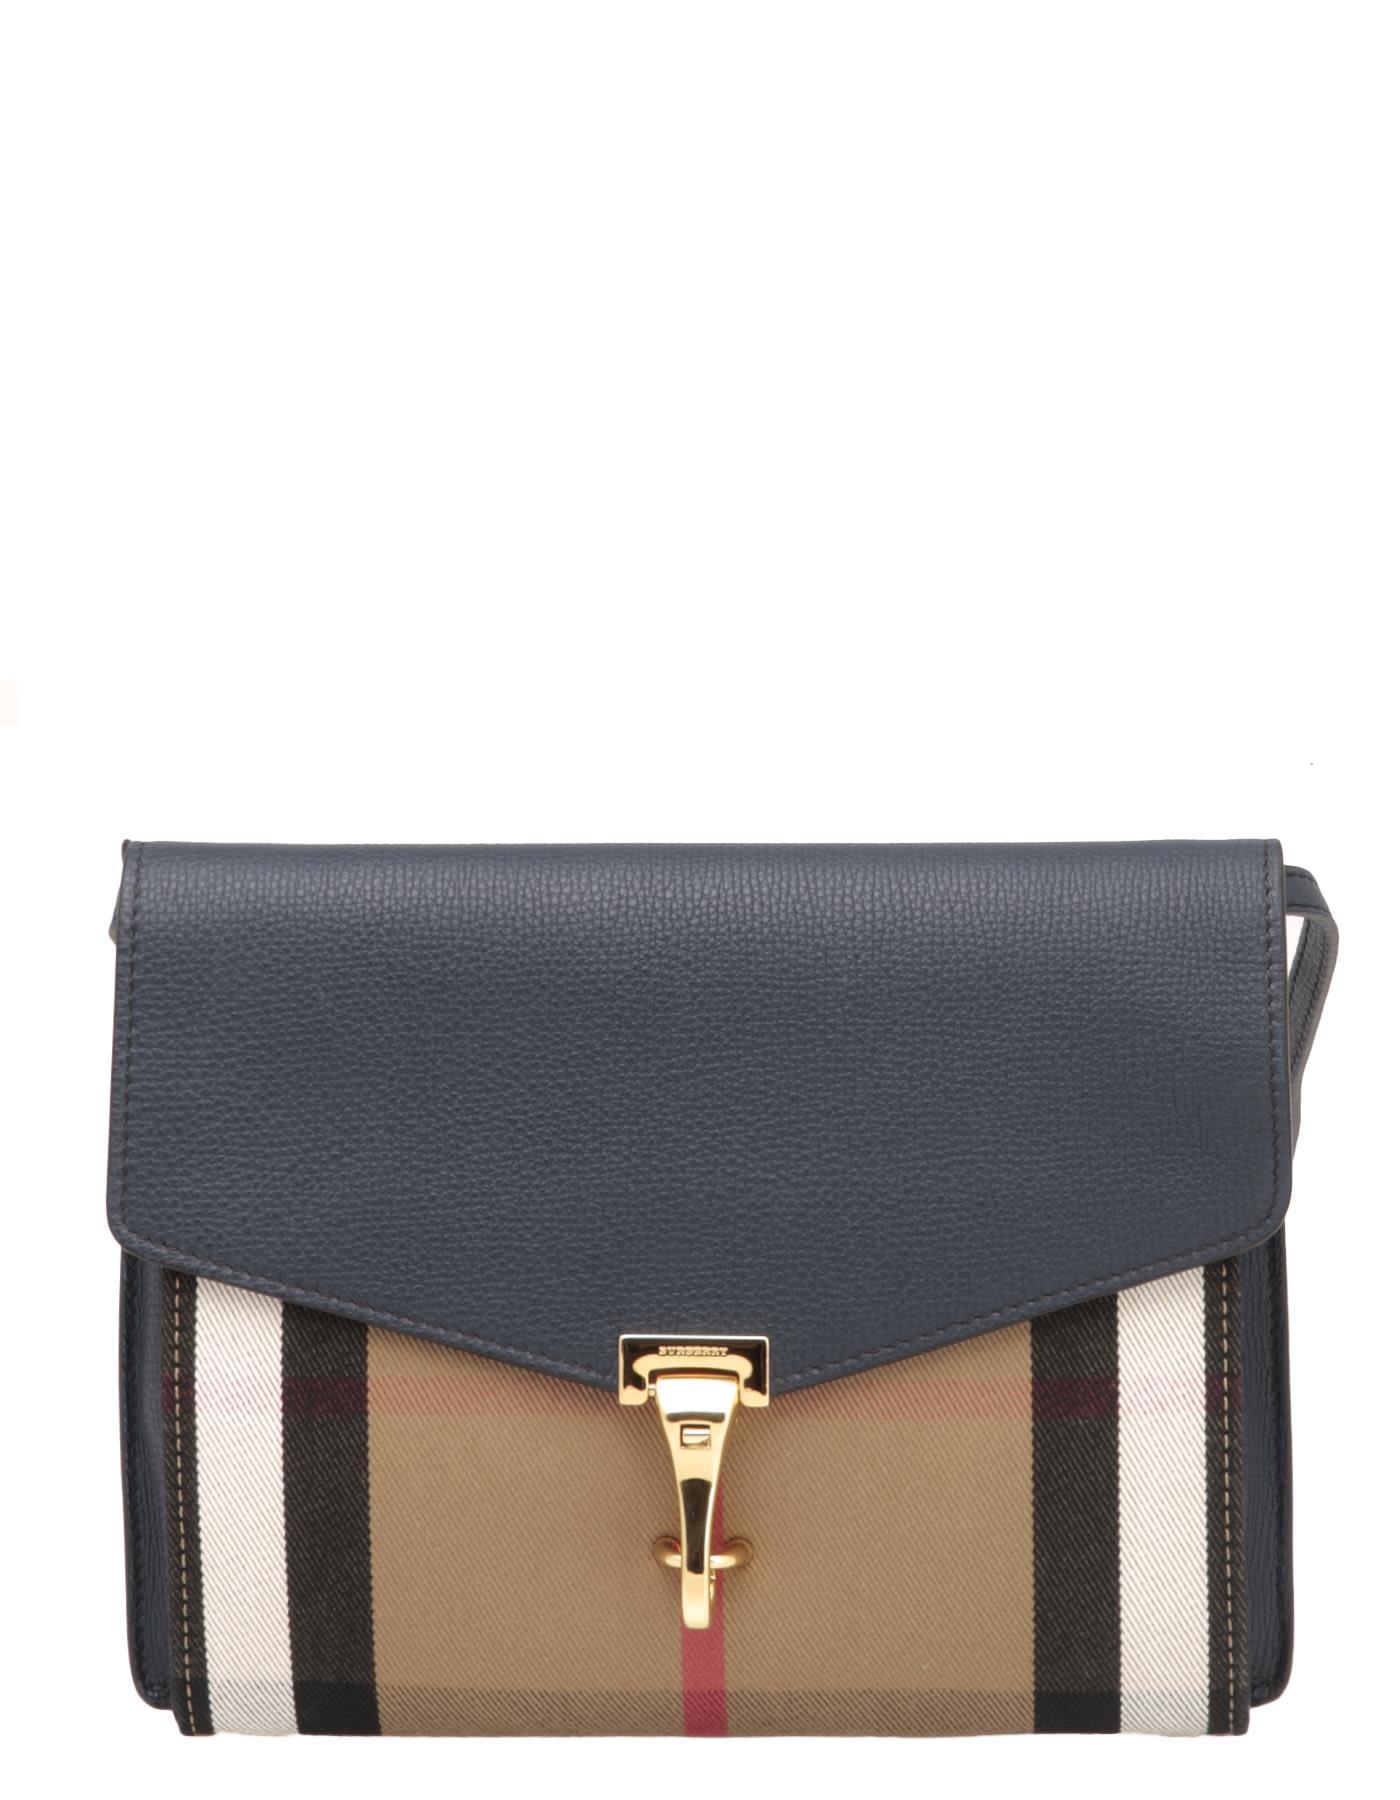 Burberry Grainy Leather Bag